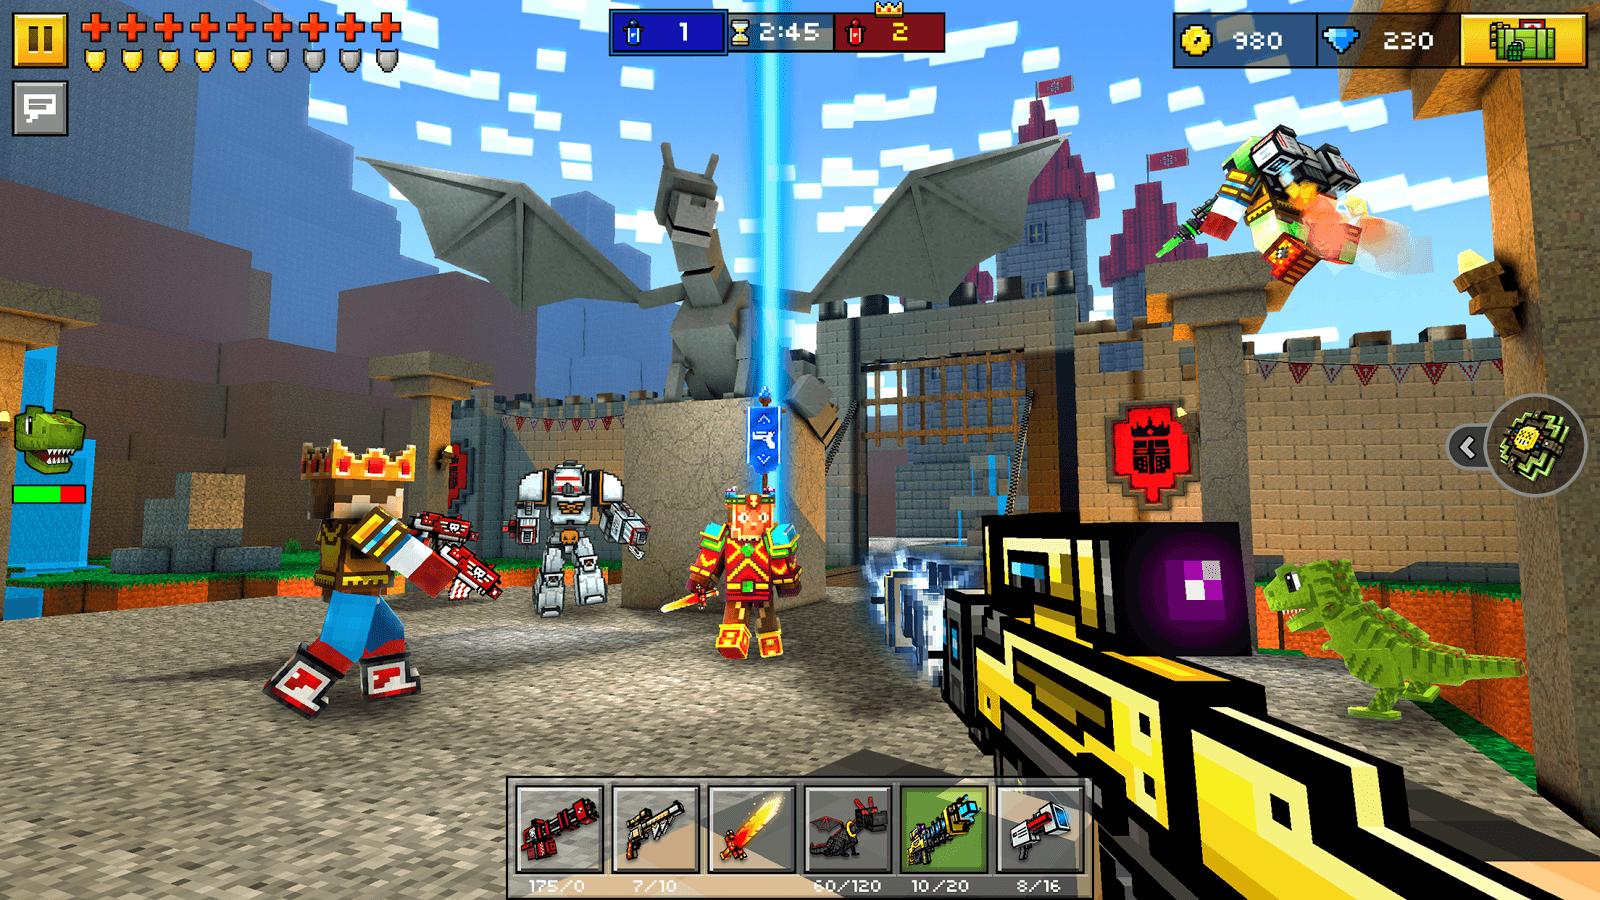 Play pixel gun 3d without download